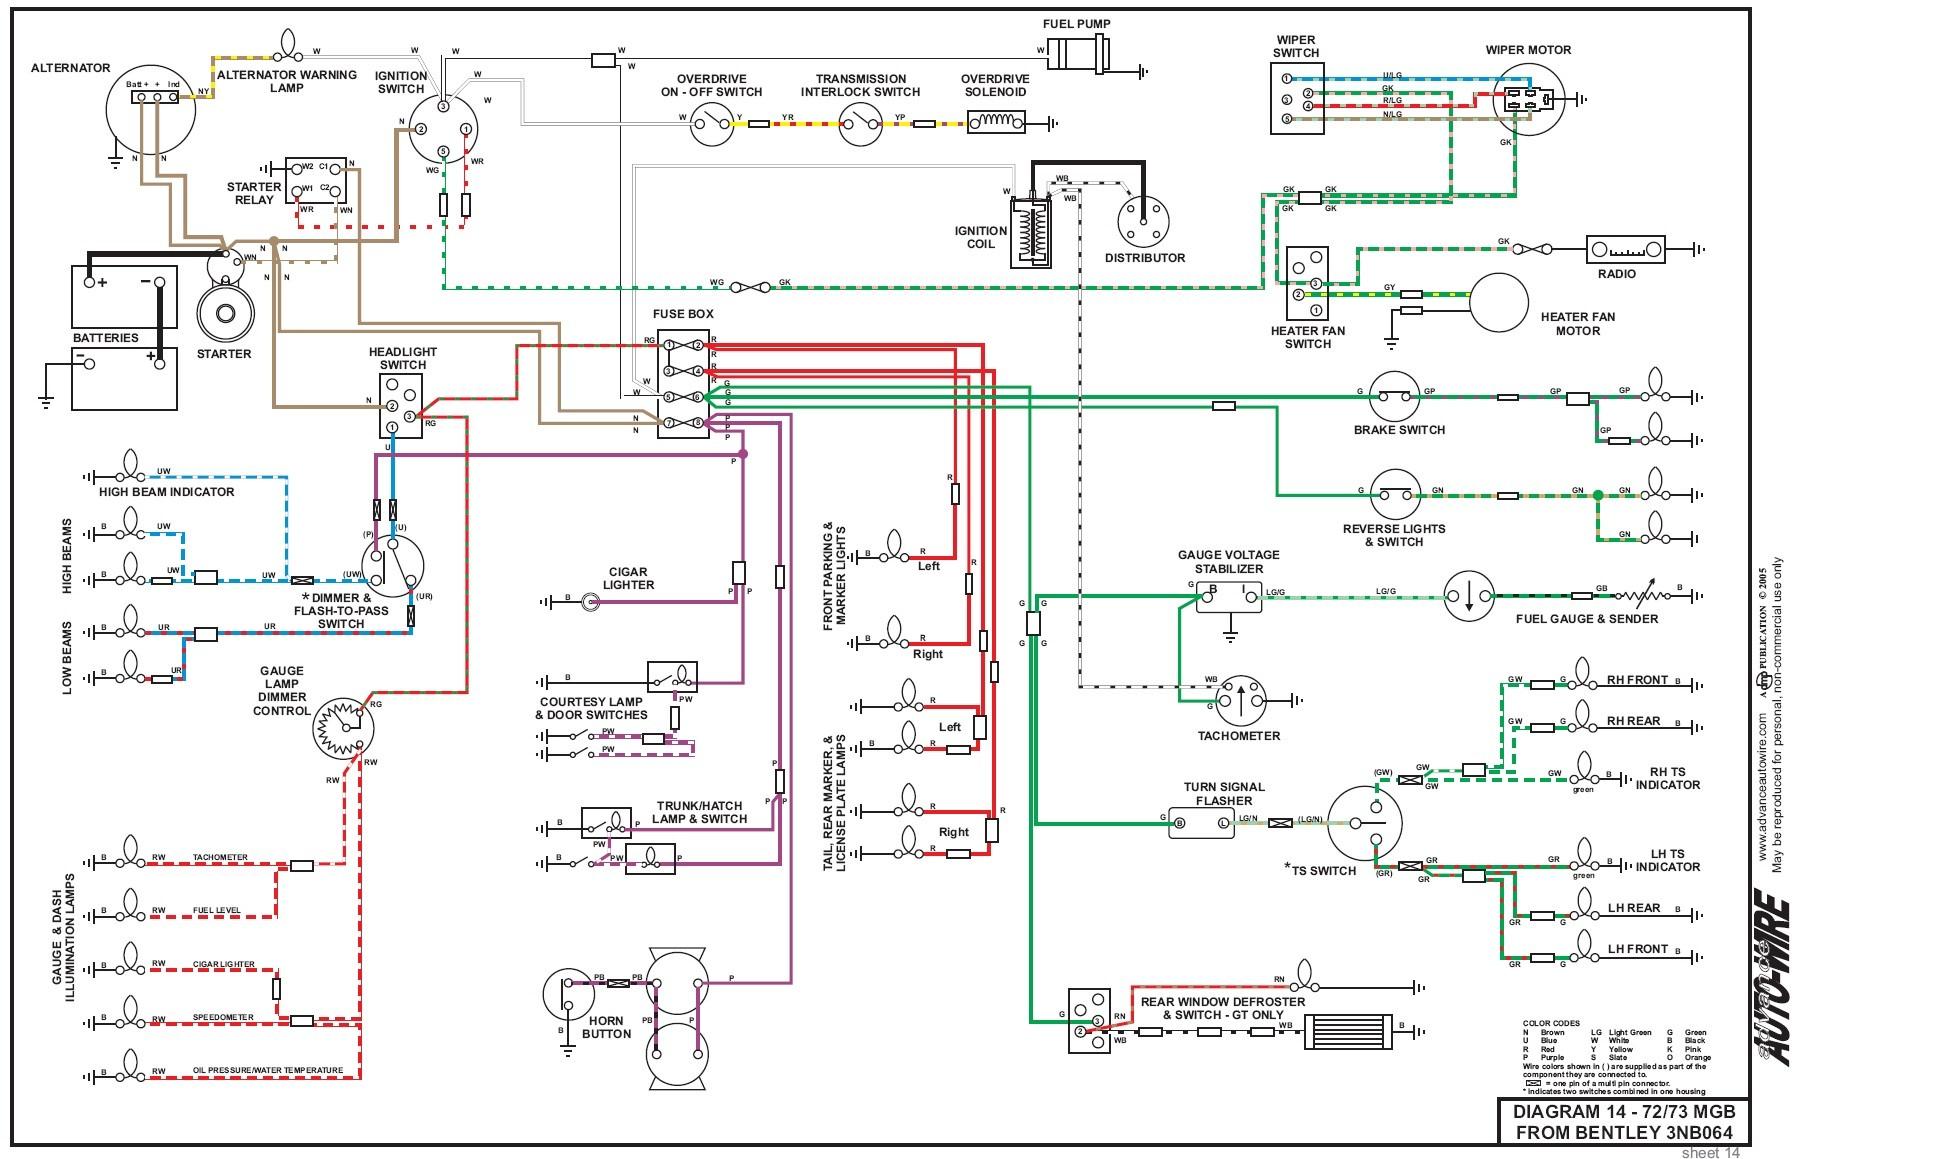 powerstat variable autotransformer wiring diagram new wiring LAN Wiring Diagram powerstat variable transformer wiring diagram wiring diagram